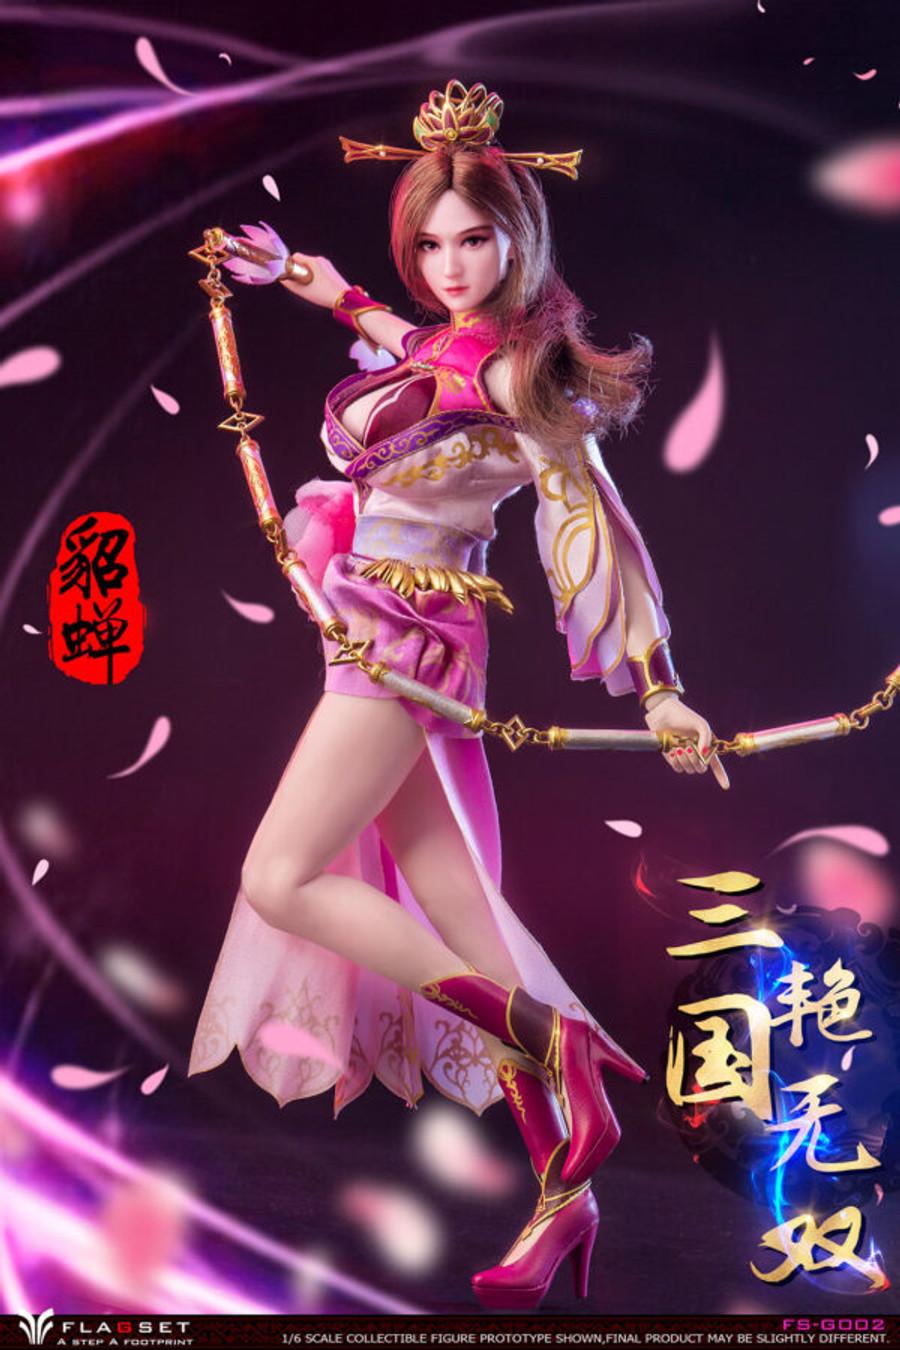 Flagset - Romance of the Three Kingdoms: Diao Chan